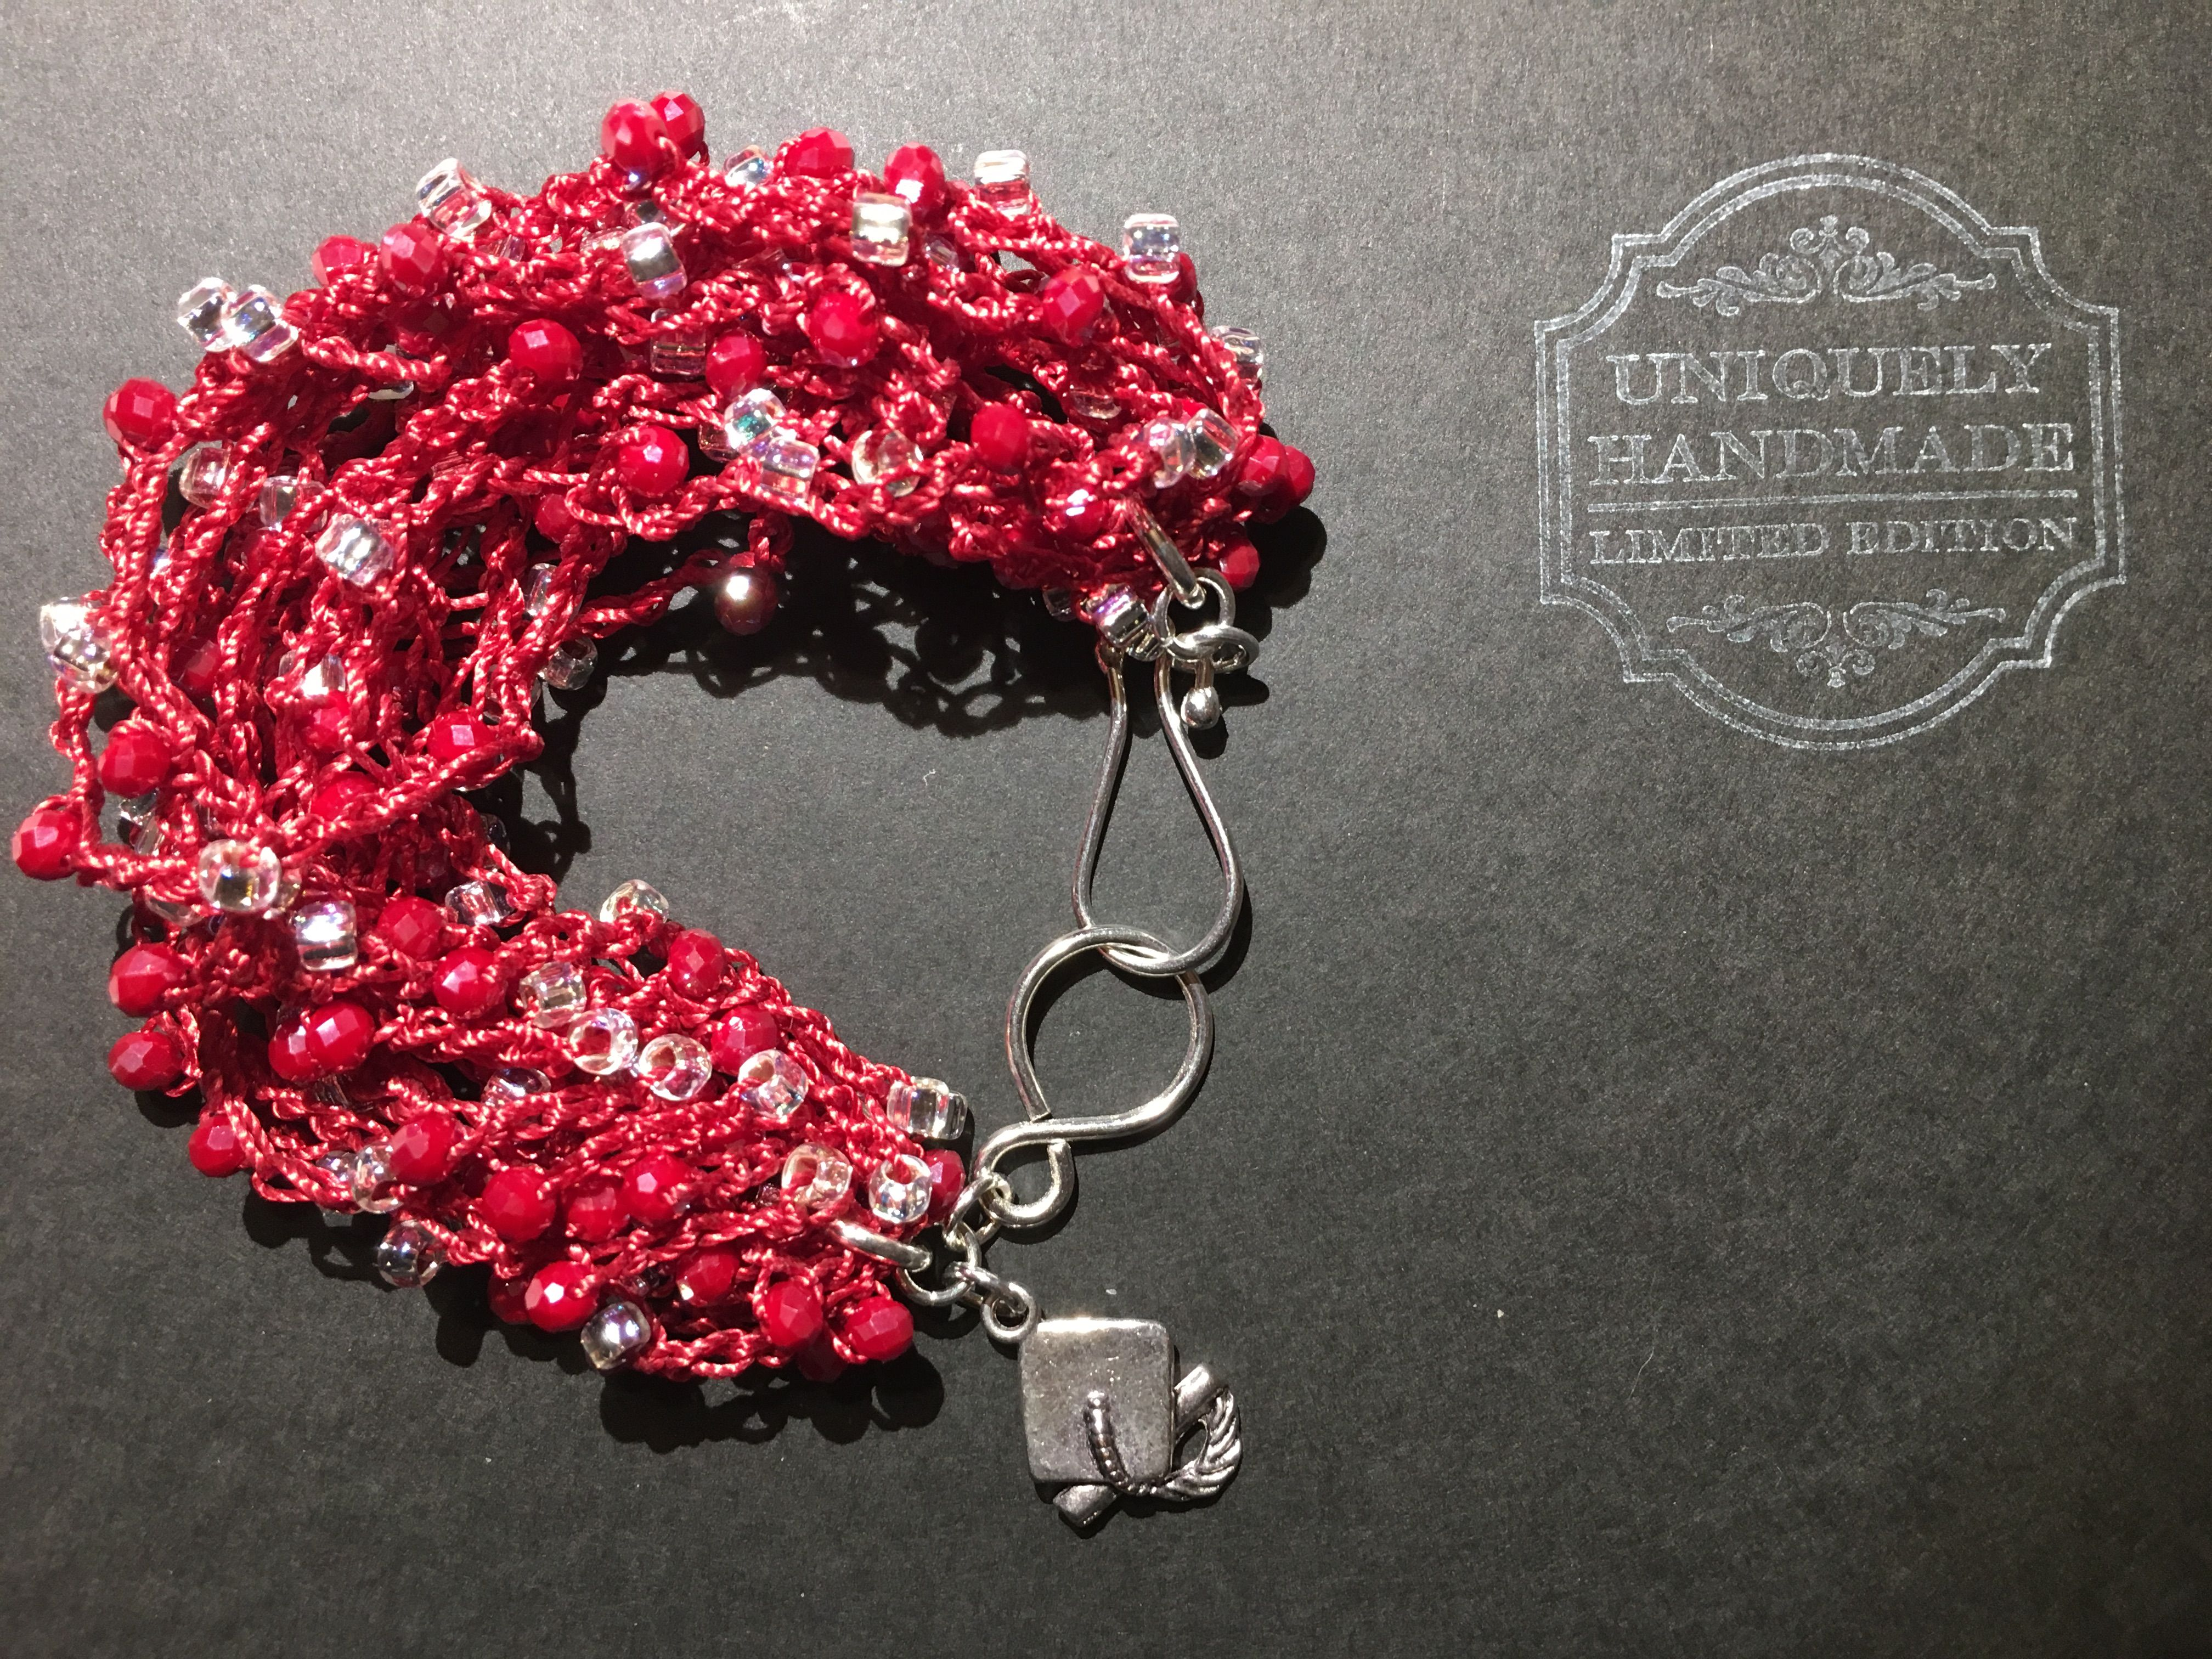 Pin by Cabral on Autism Bracelets Autism bracelets